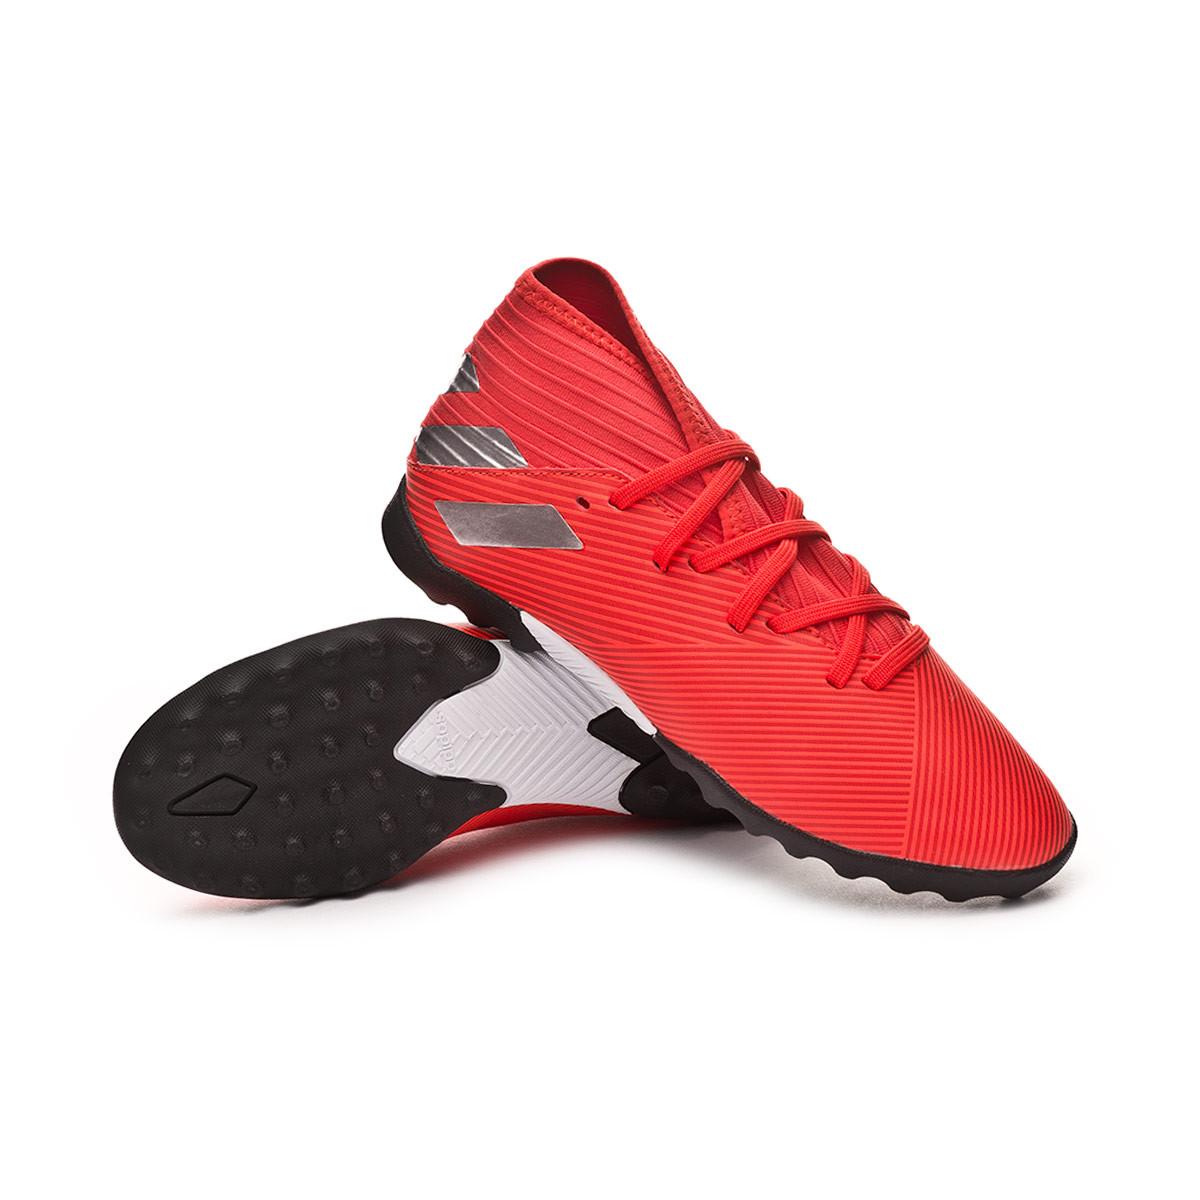 a72863b90c2 Football Boot adidas Nemeziz 19.3 Turf Niño Active red-Silver metallic-Solar  red - Football store Fútbol Emotion